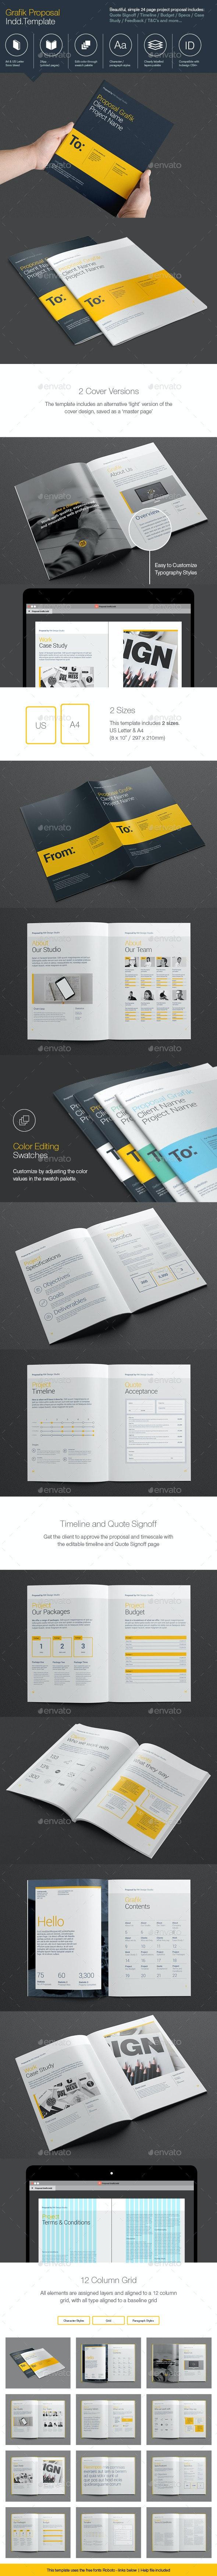 Grafik Proposal - Proposals & Invoices Stationery